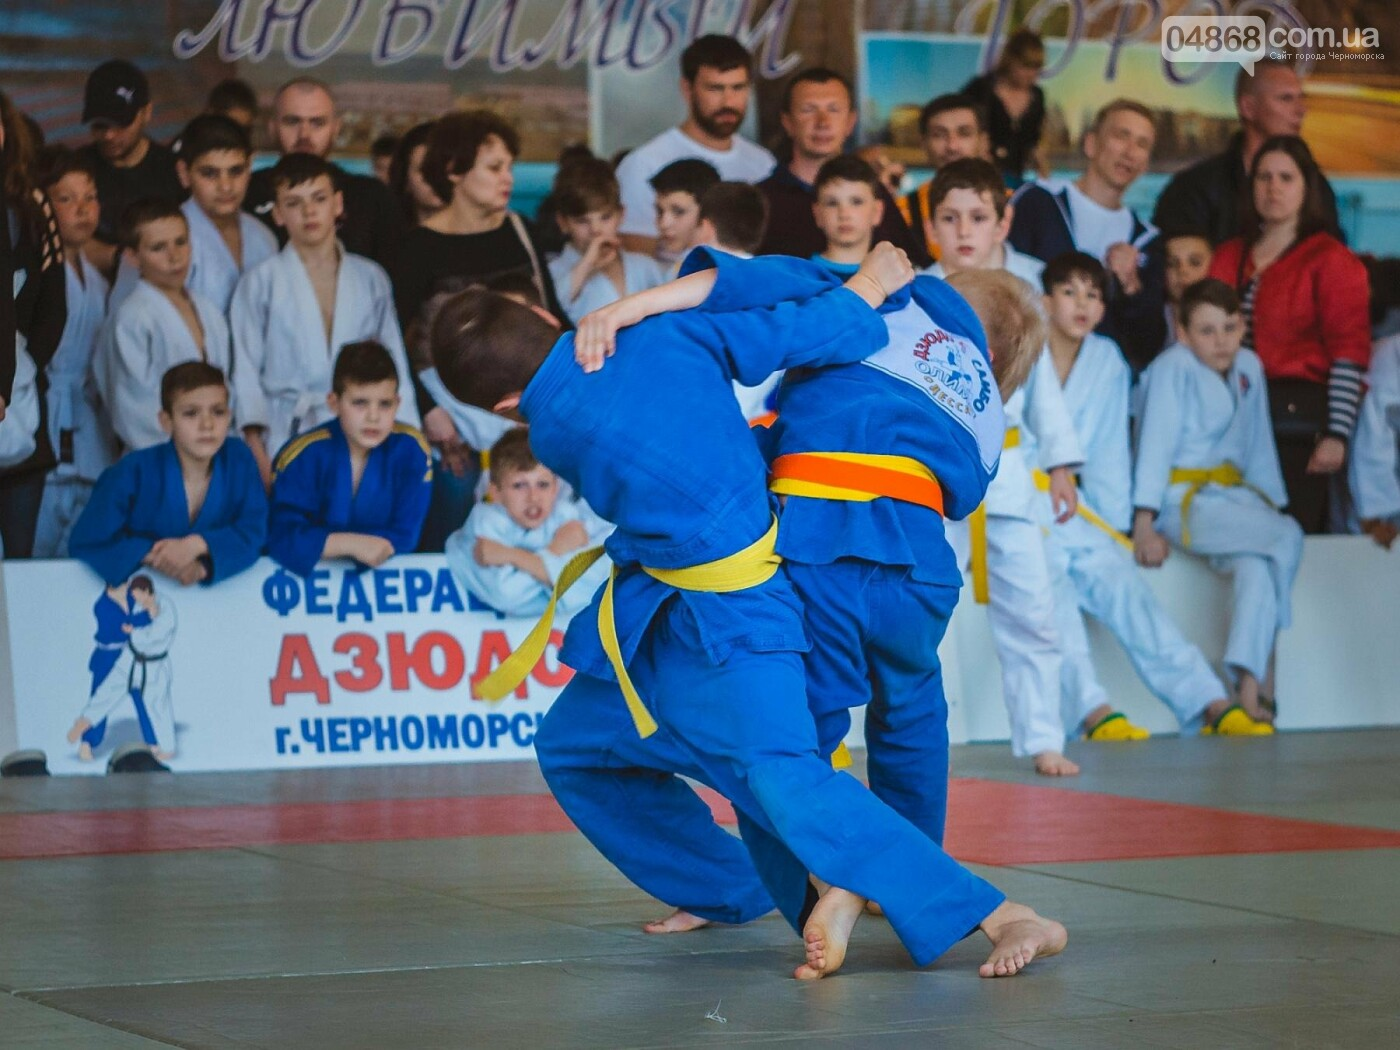 В Черноморске прошел турнир по дзюдо на Кубок мэра, фото-19